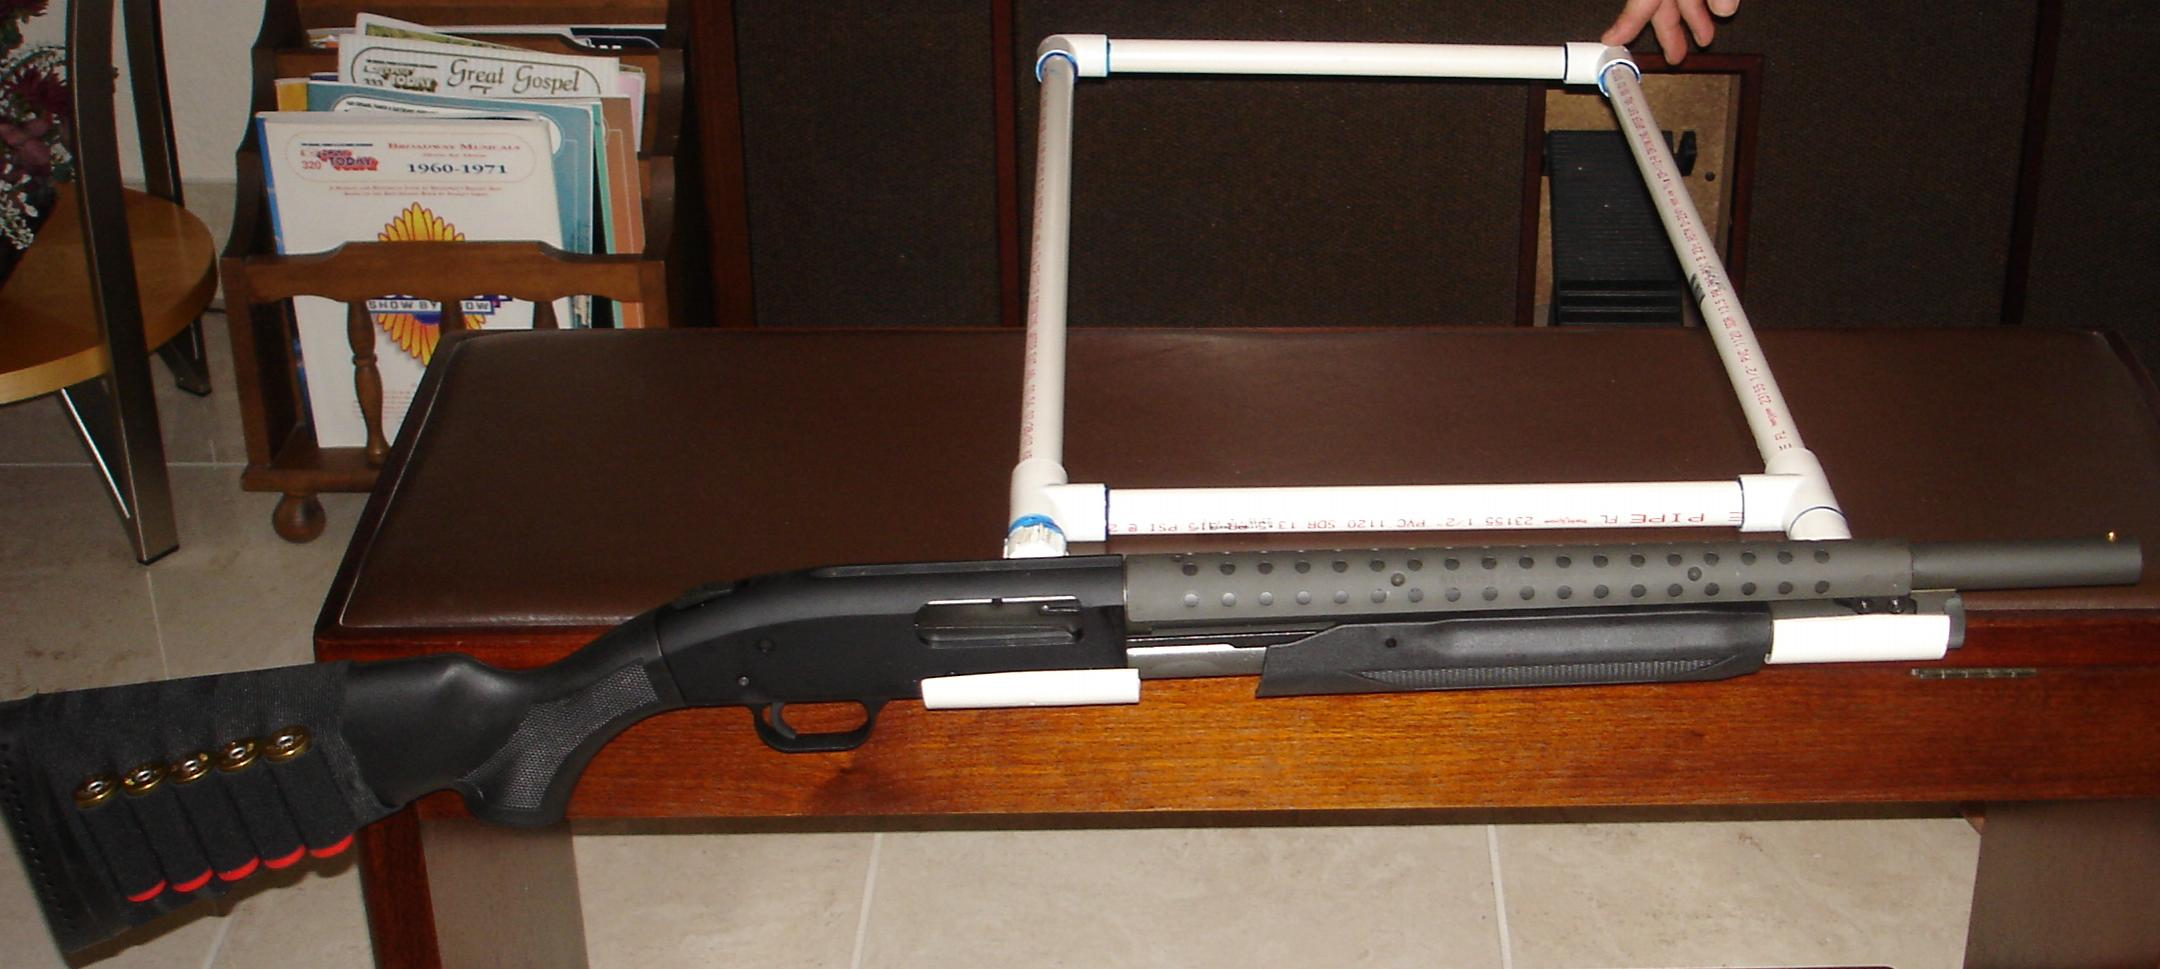 Shotgun Bedbuddy-dsc03330.jpg